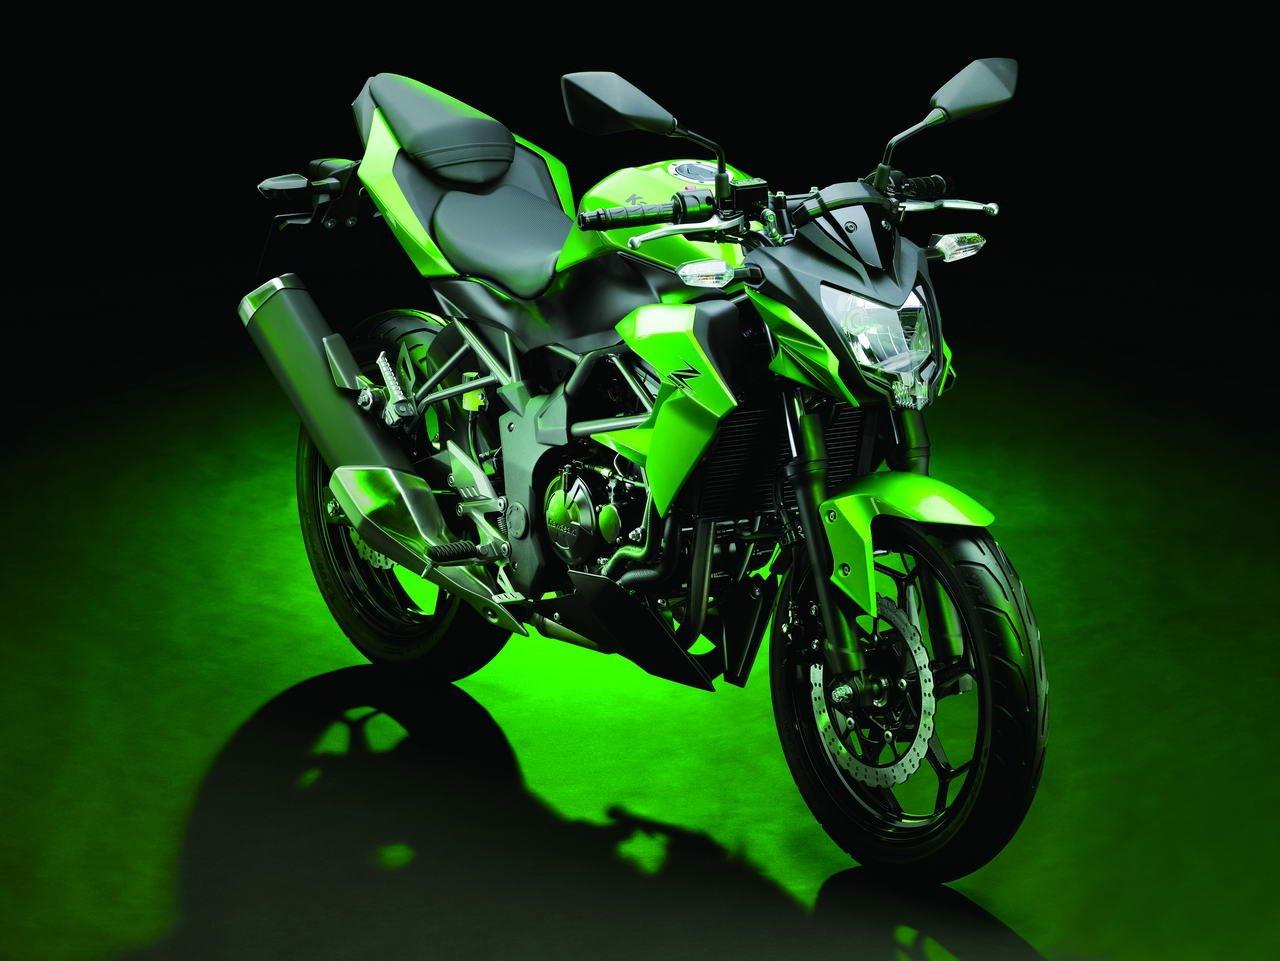 Listino Kawasaki W 800 Naked Mediand - image 15547_1 on http://moto.motori.net